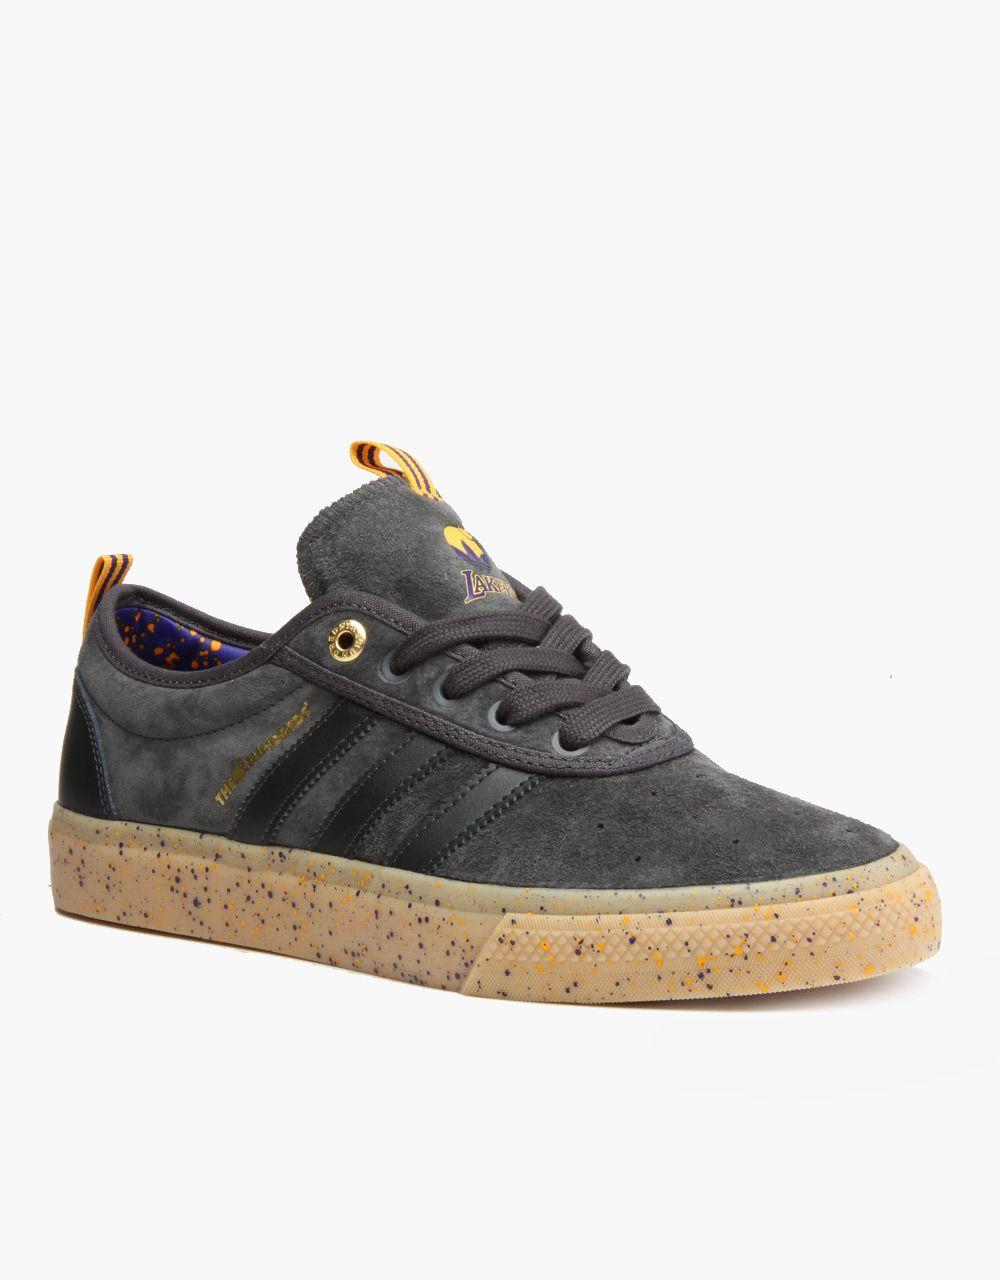 Adidas NBA x The Hundreds Adi-Ease Adv Skate Shoes - Grey/Purple/